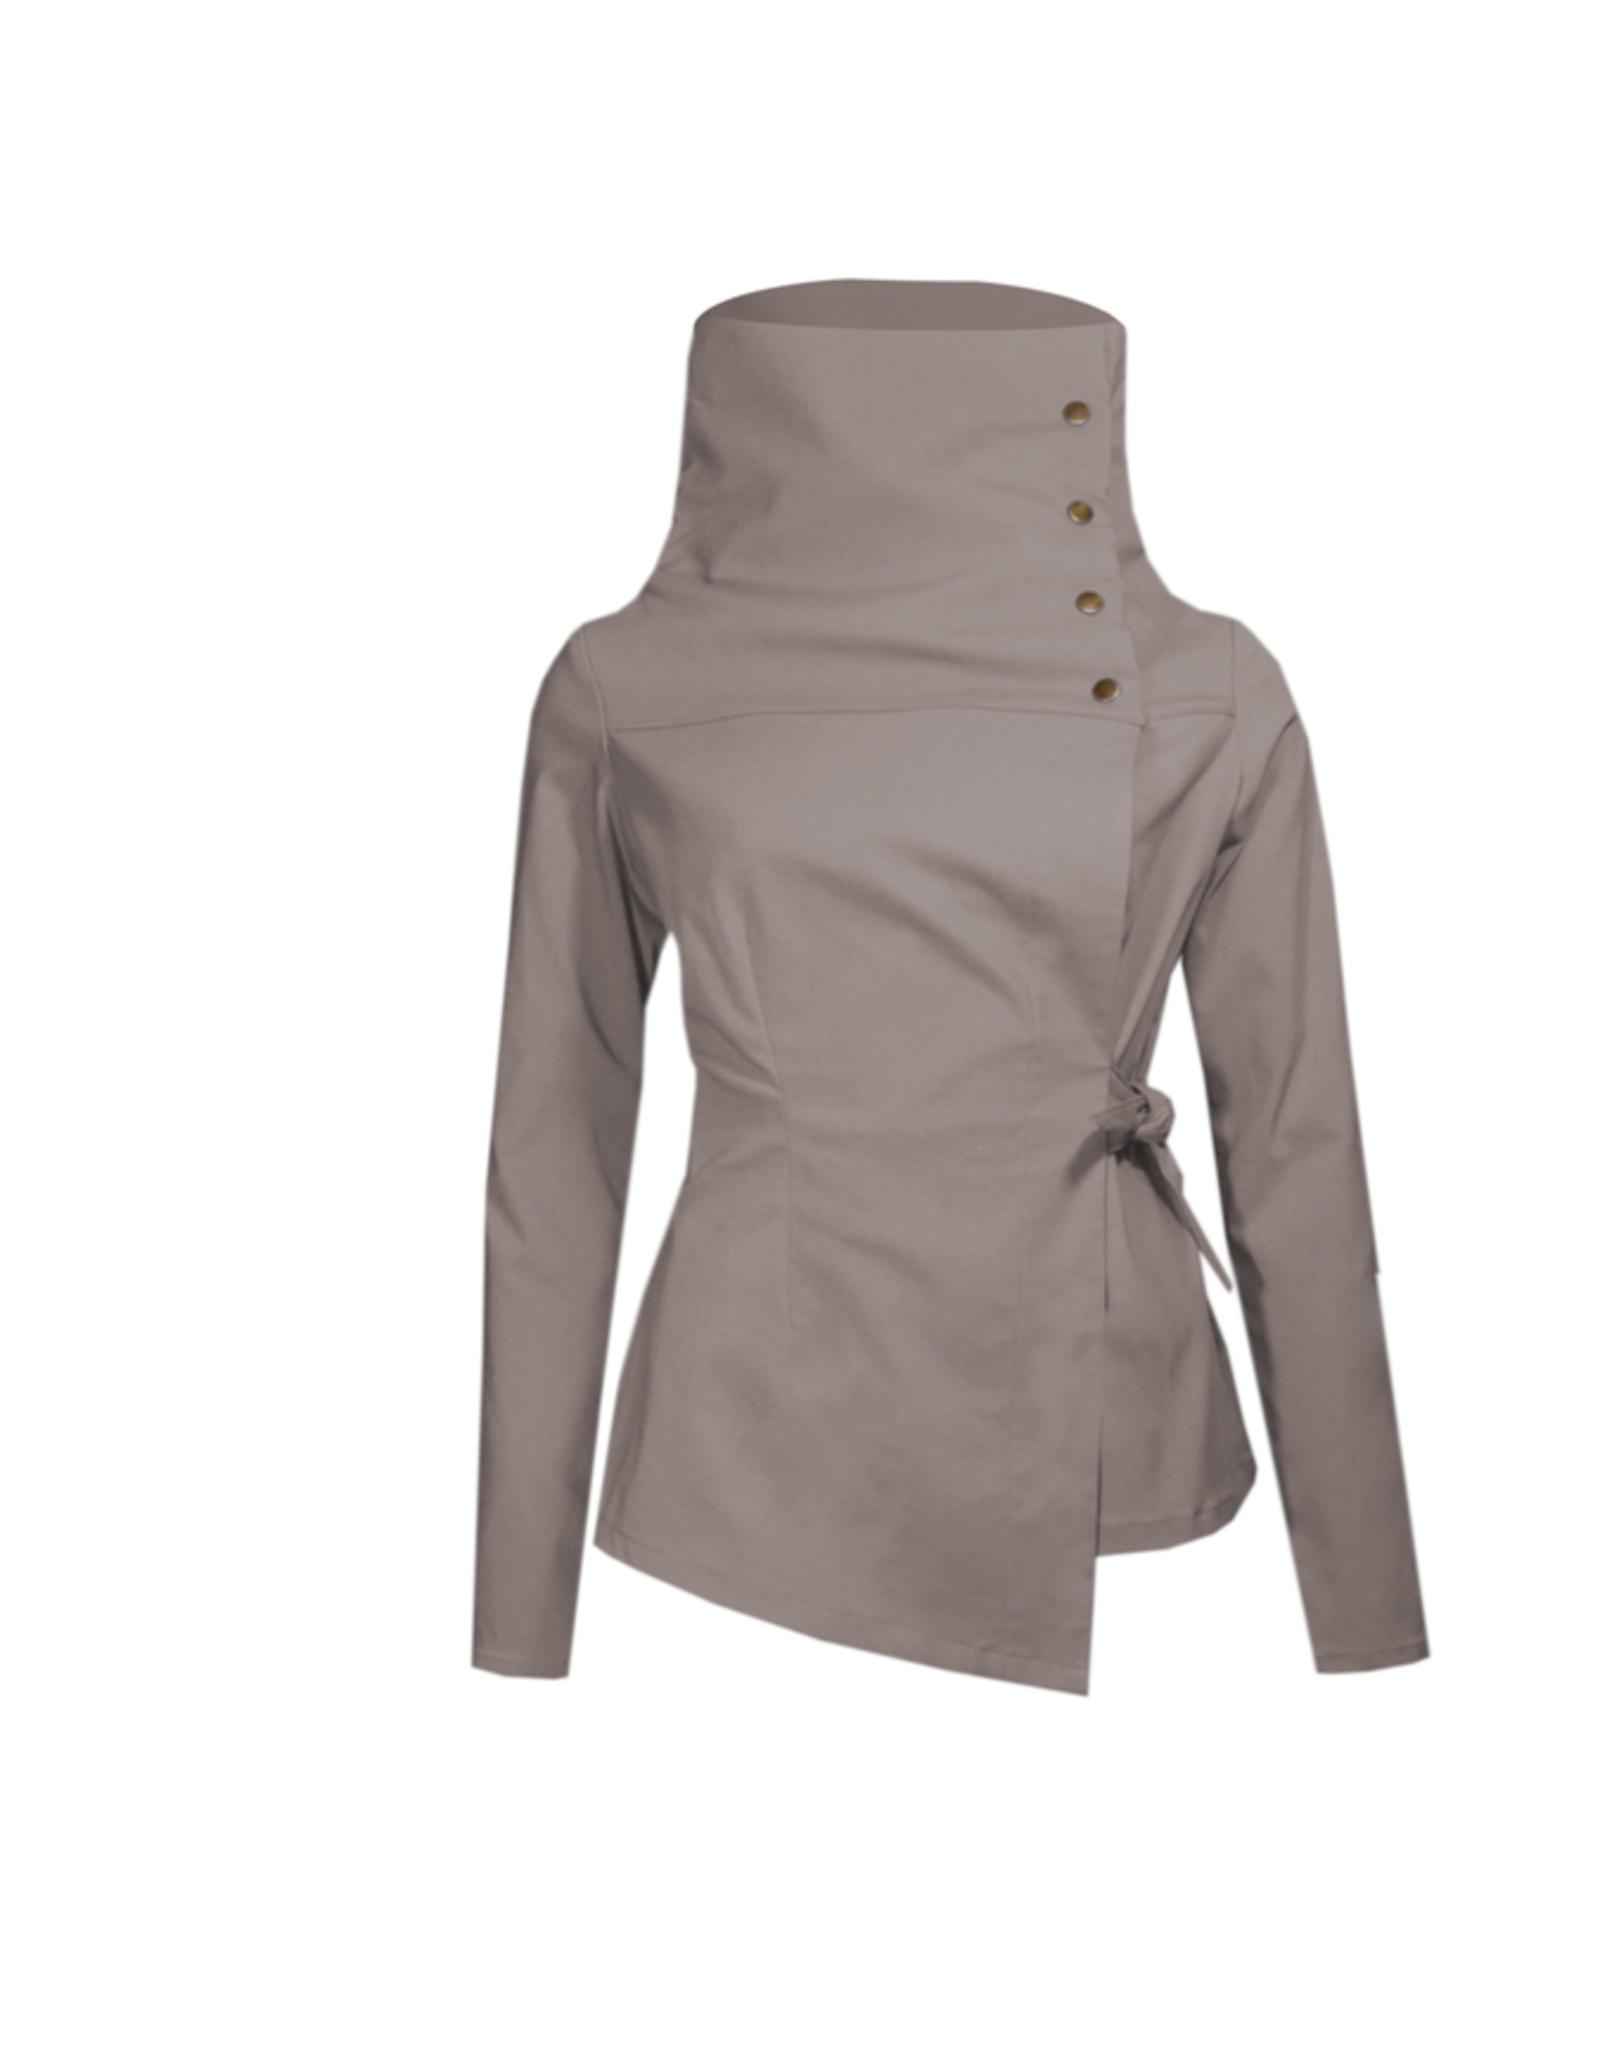 Asymmetrical Deluxe Jacket - Various Colours